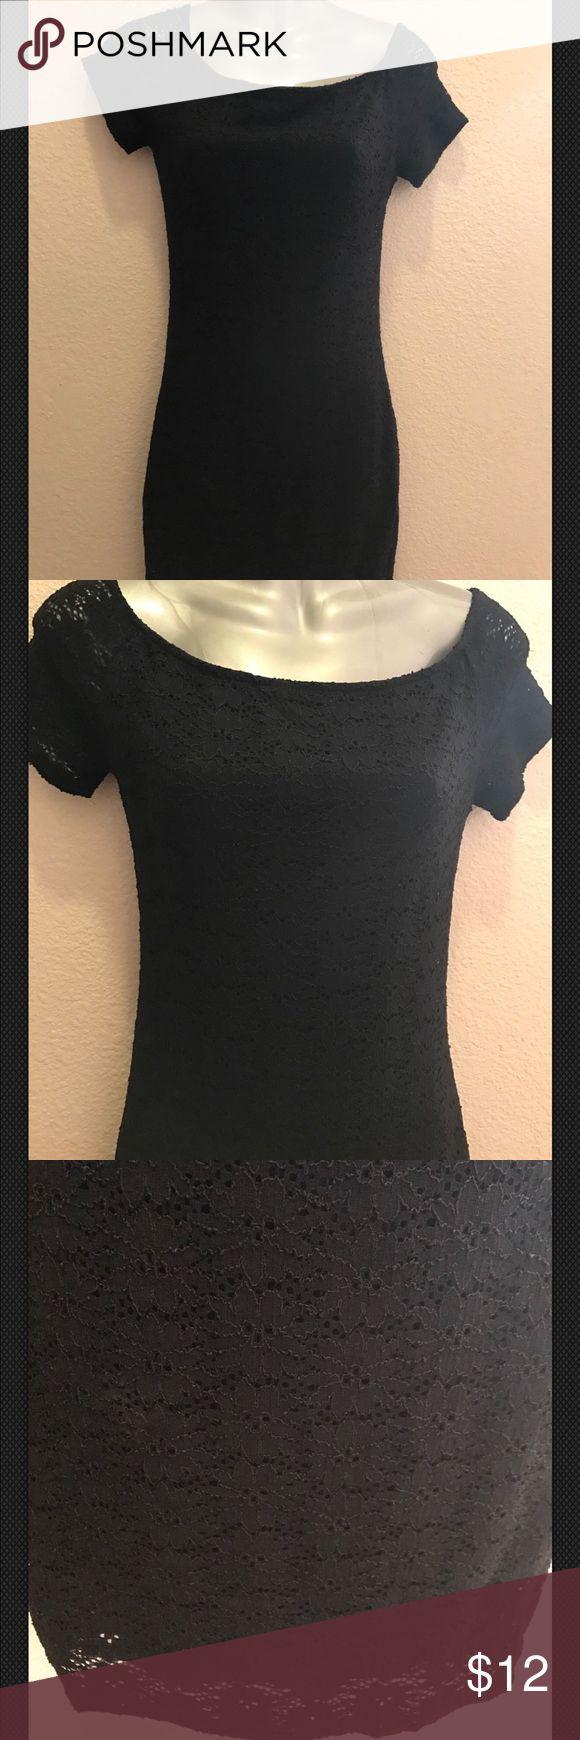 Lush Clothing Lace Dress Size S/M Lush Clothing Lace Dress Size S/M. No size on the dress but seem to be a S/M Lush Dresses